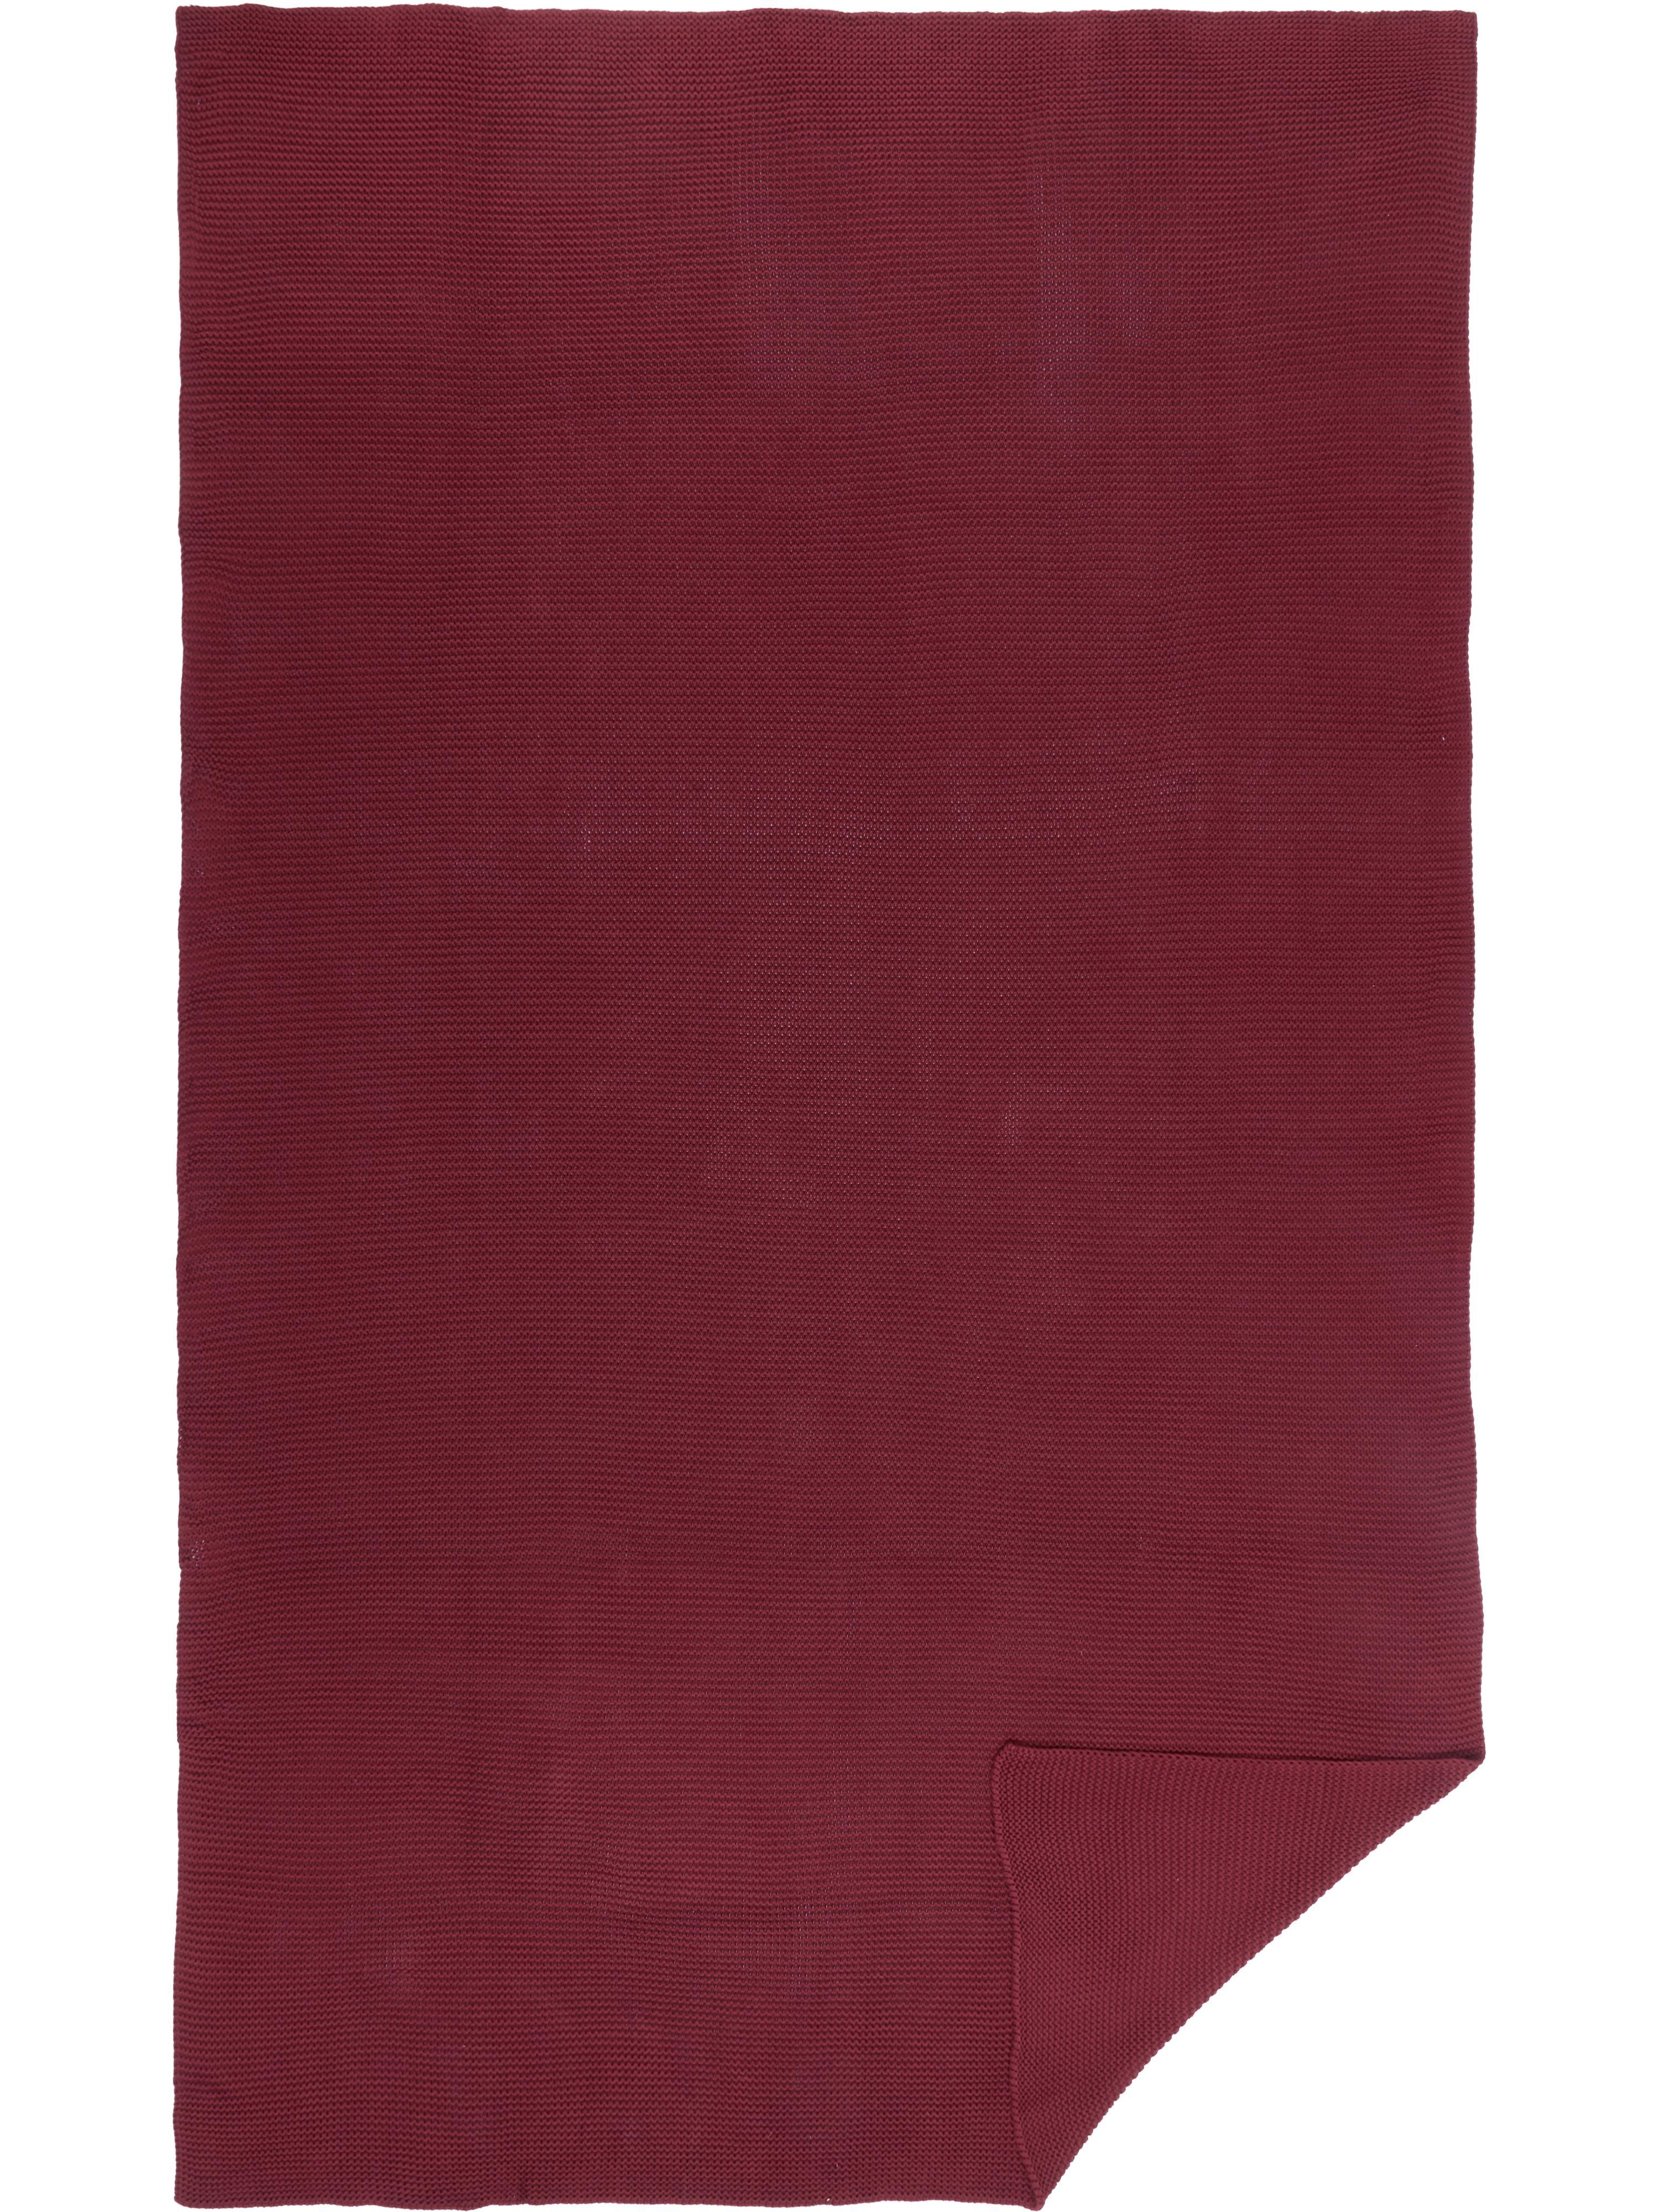 Gebreide plaid Aladyn, 100% katoen, Donkerrood, 150 x 200 cm